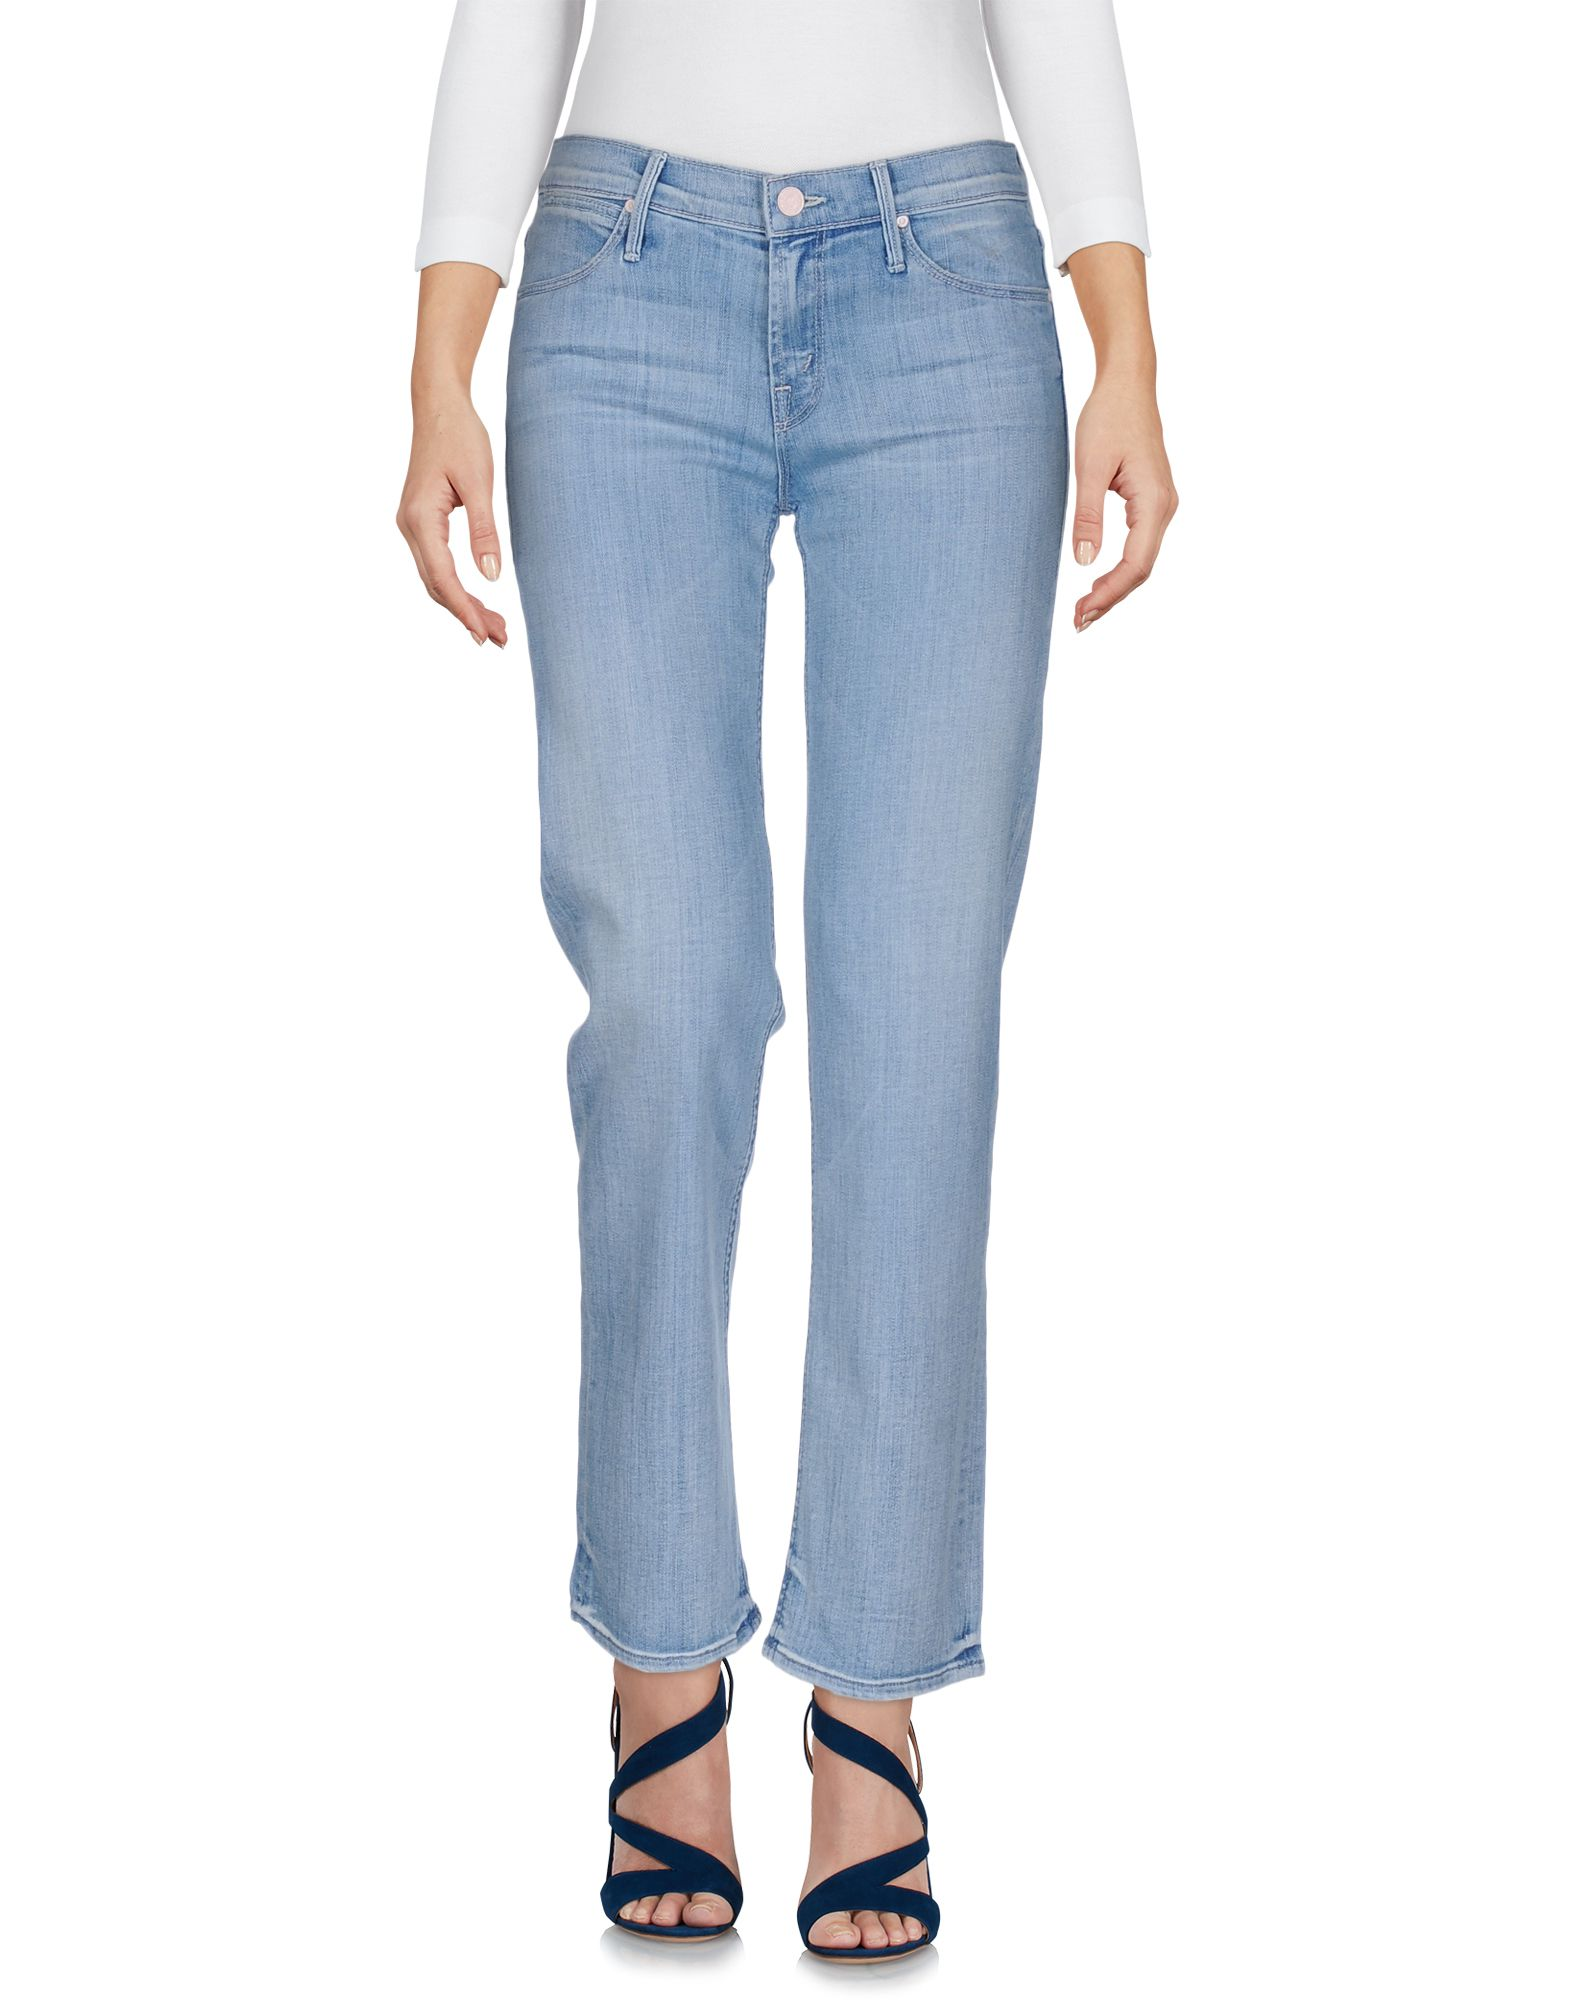 MOTHER Damen Jeanshose Farbe Blau Größe 3